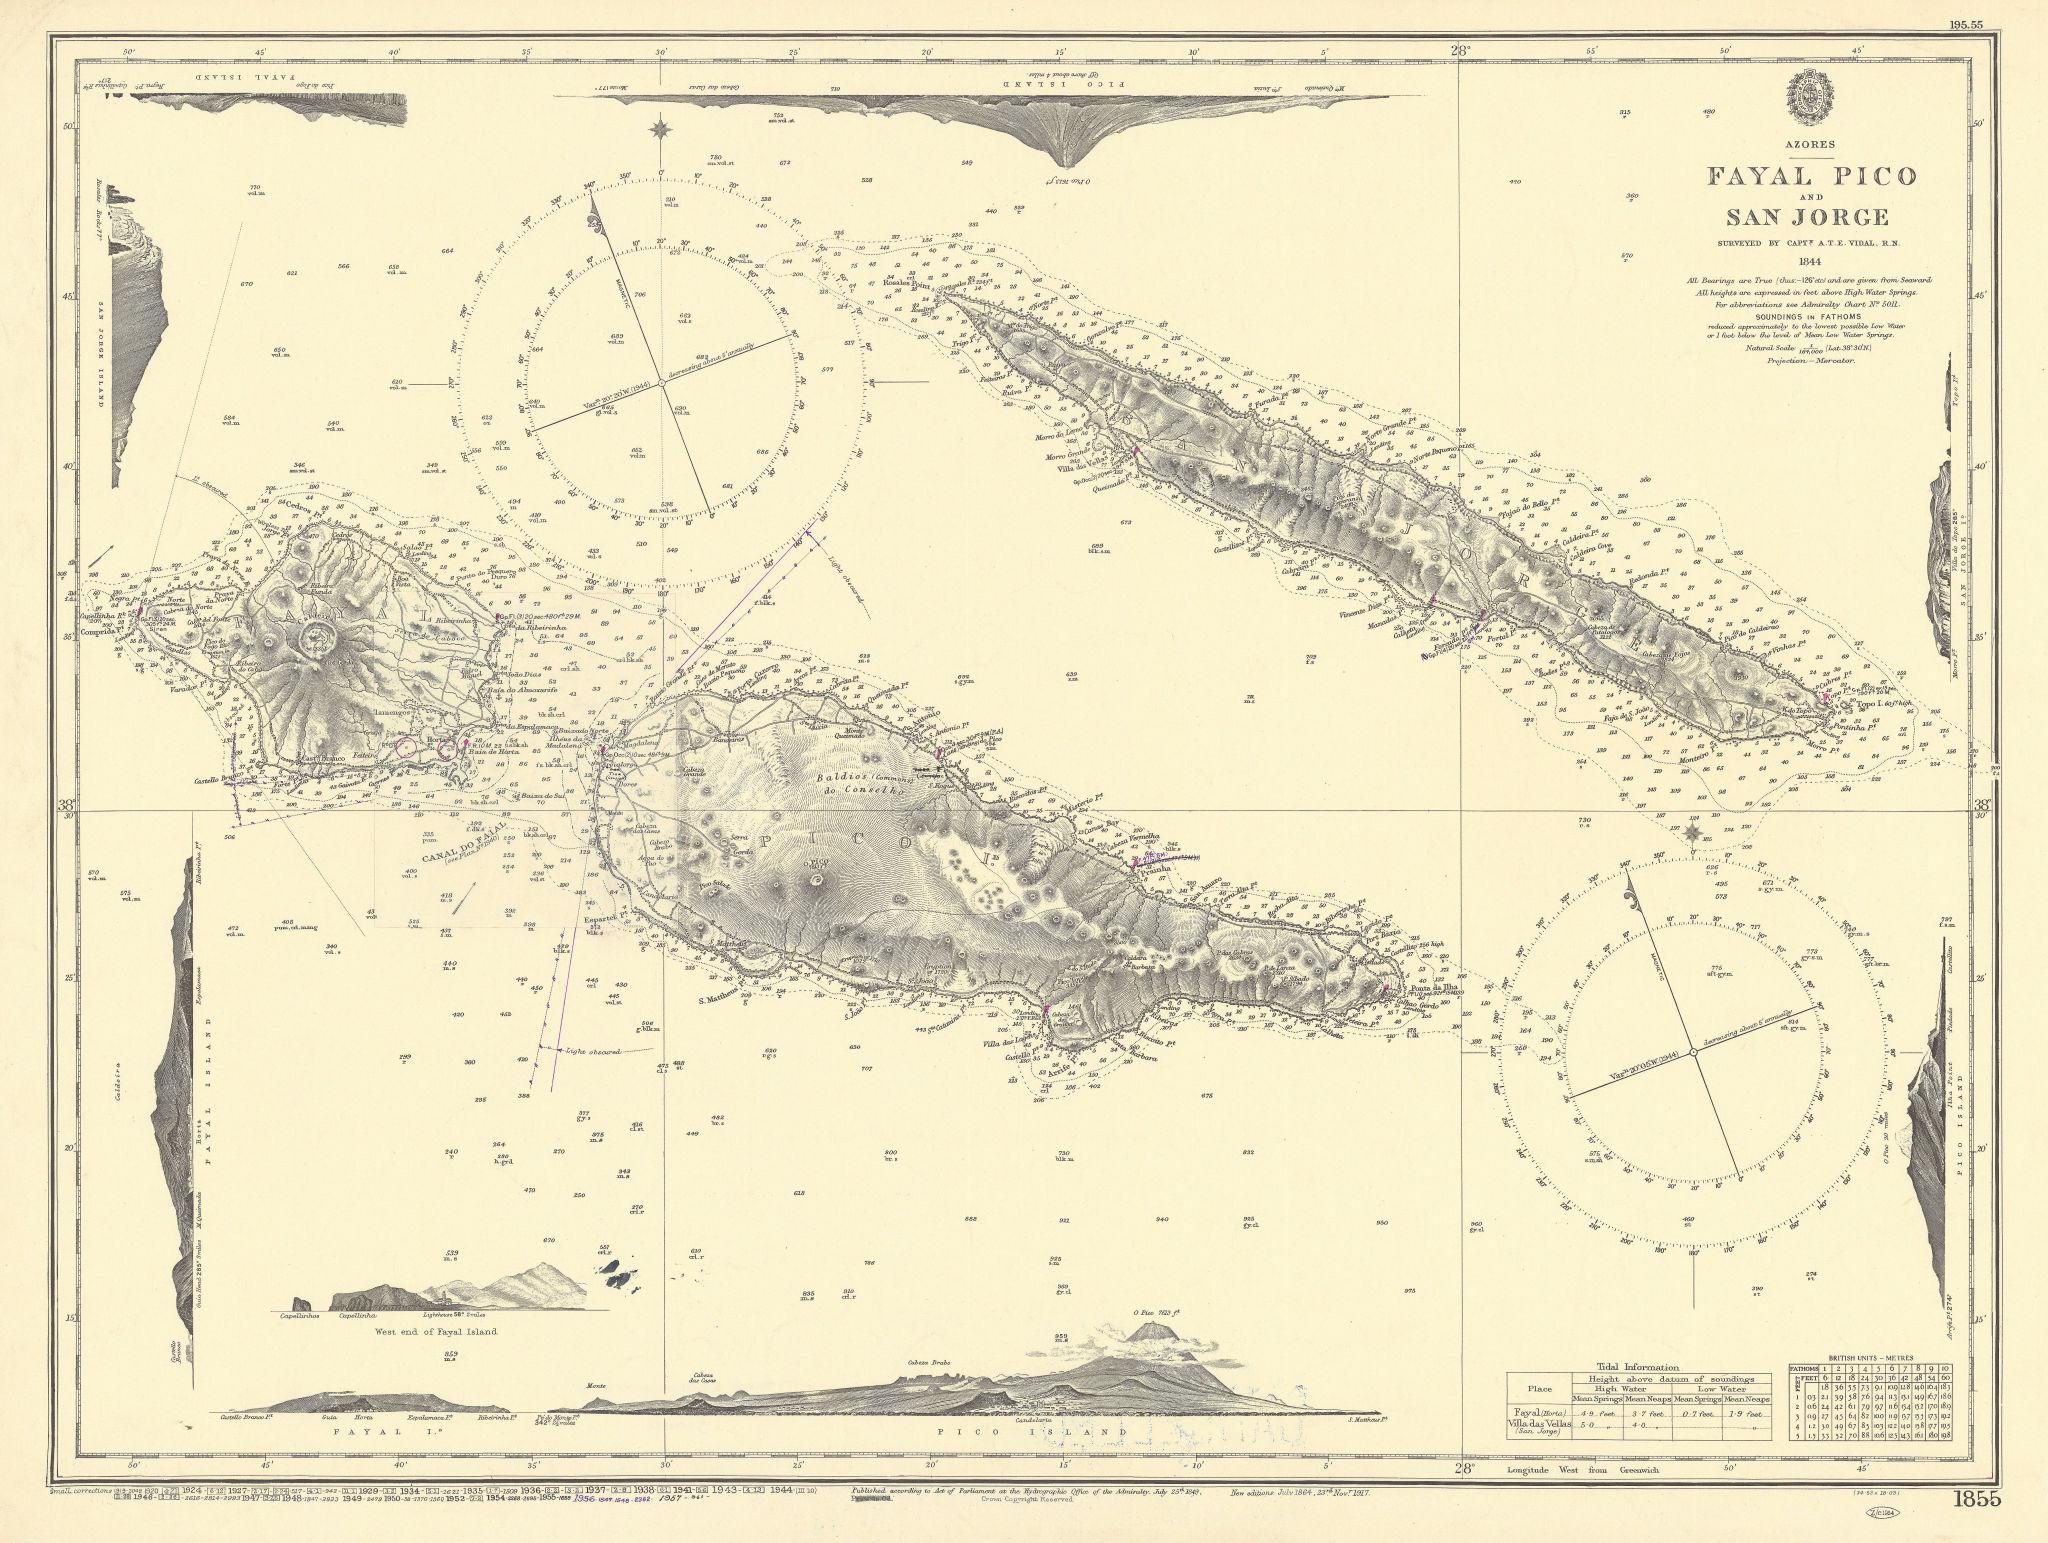 Azores - Fayal Pico & San Jorge. ADMIRALTY sea chart 1849 (1957) old map